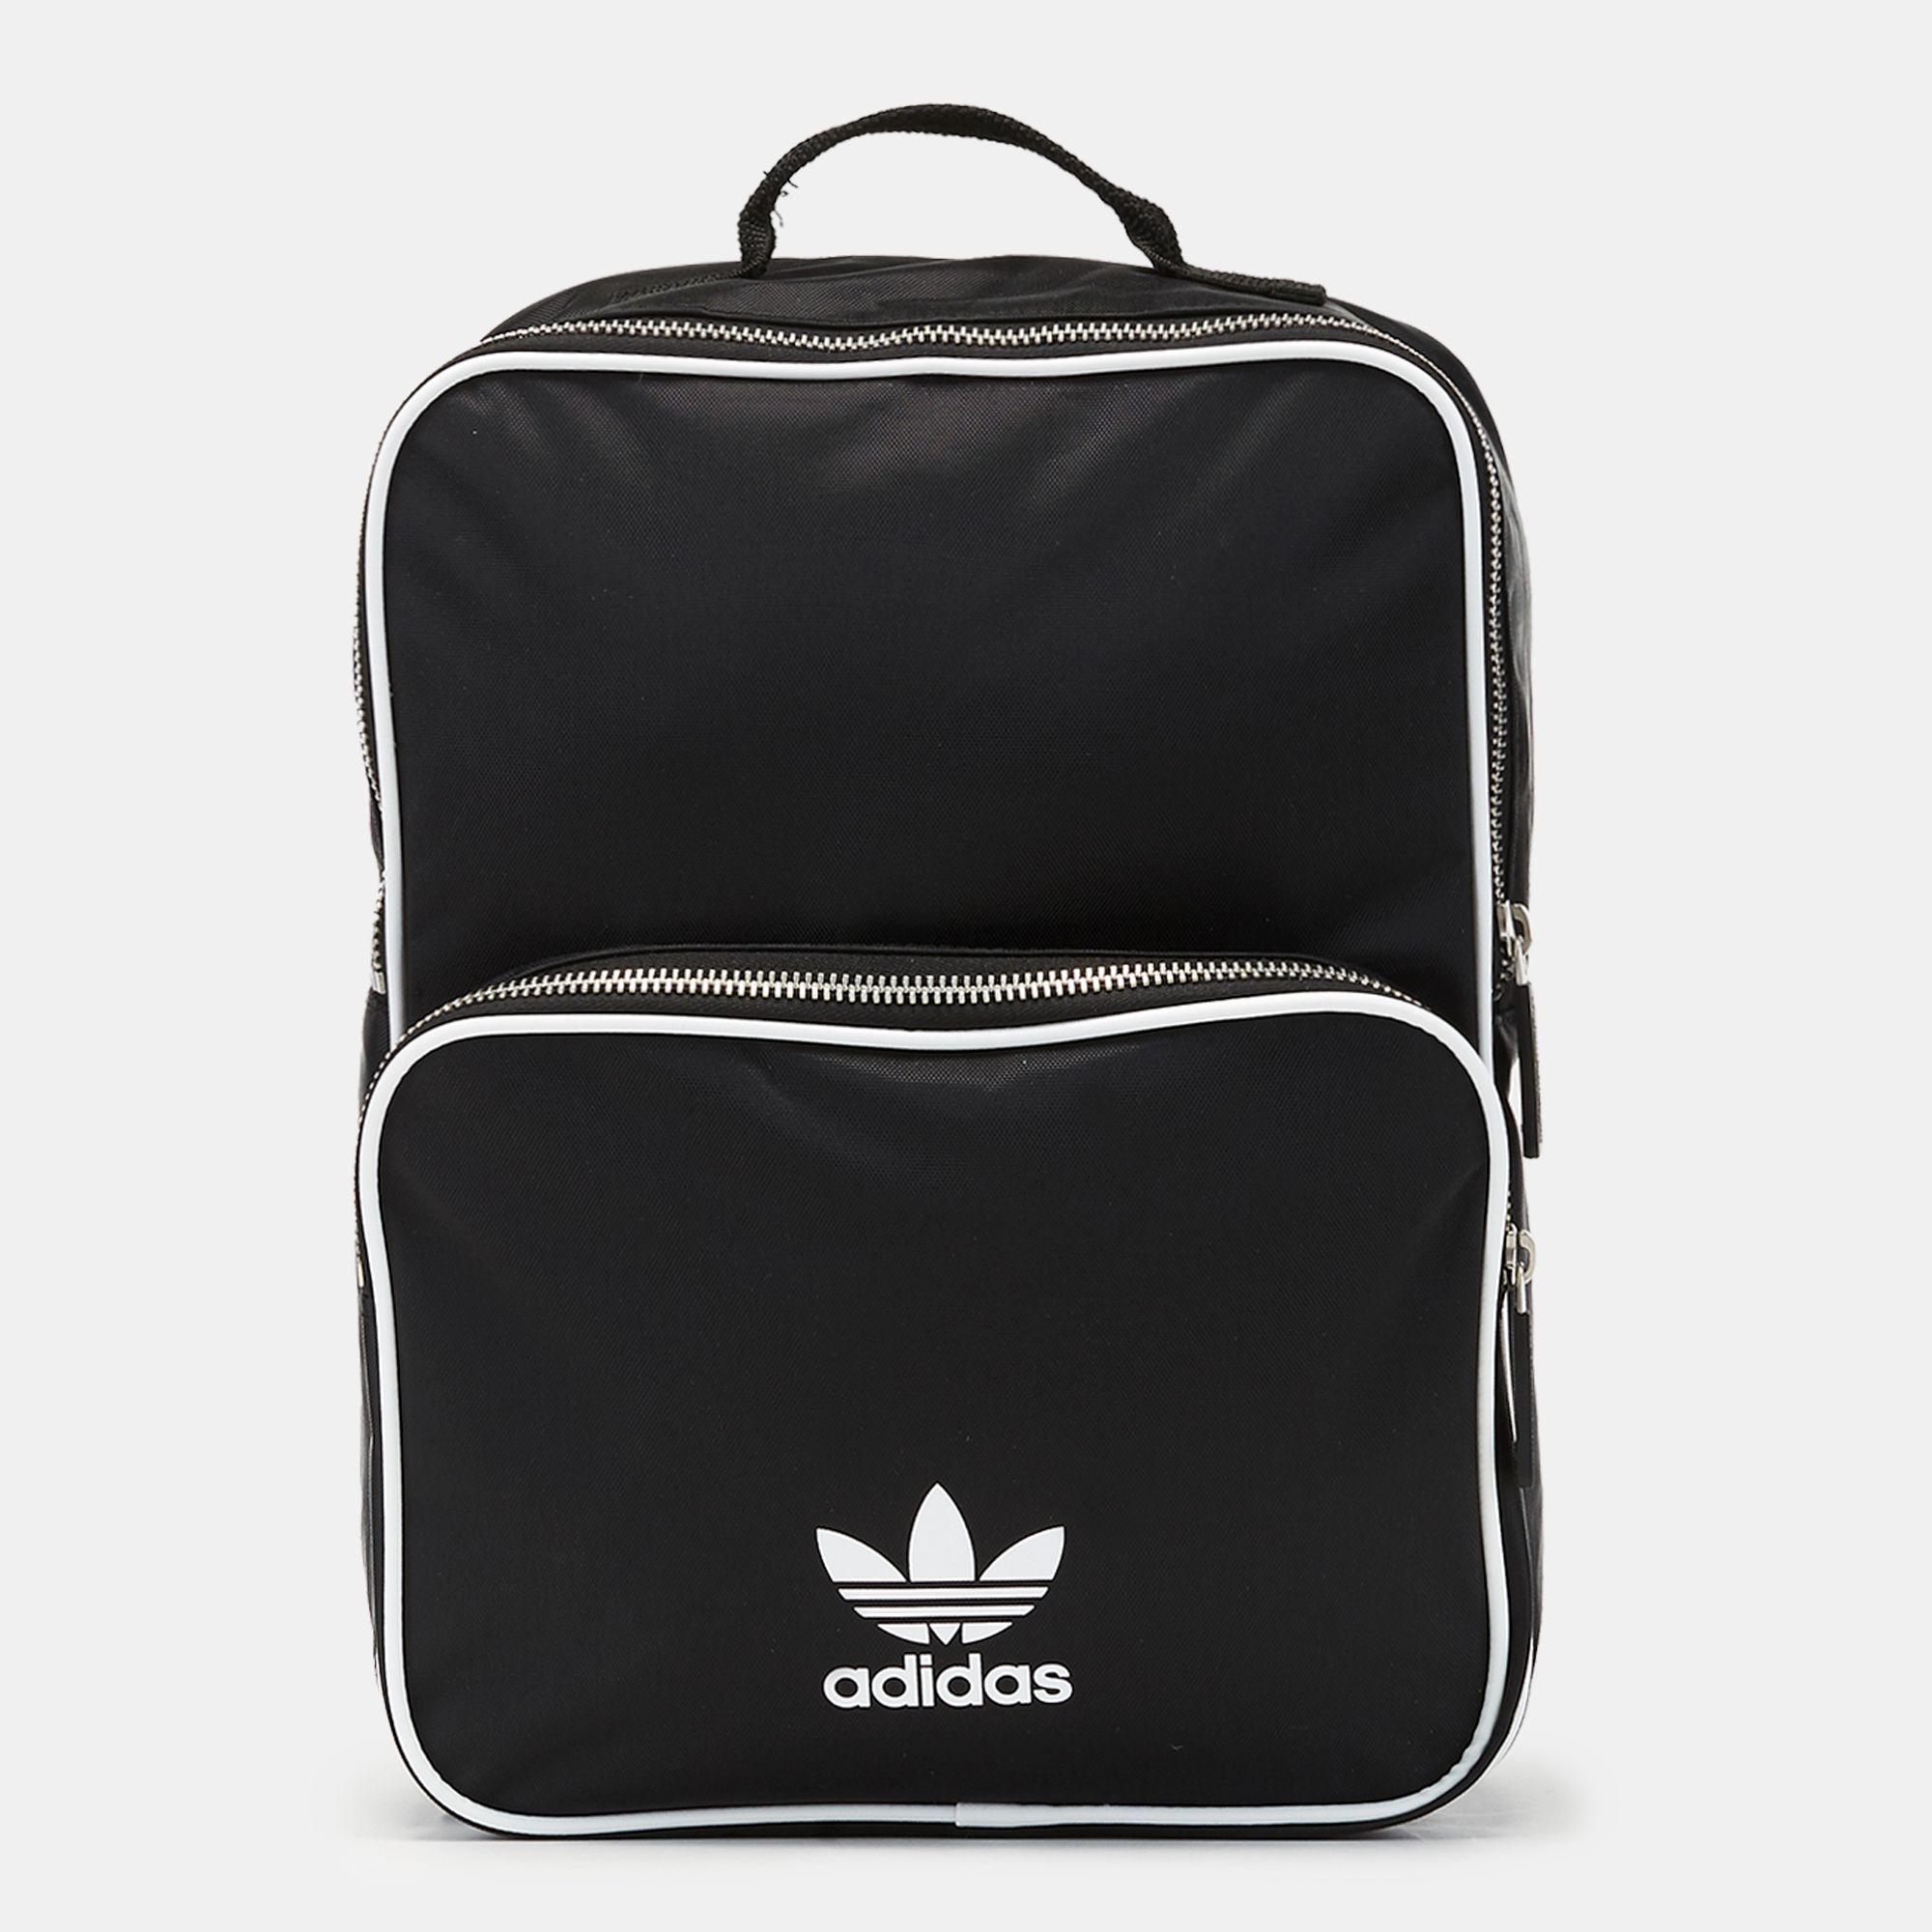 adidas Originals Classic Backpack  1b760170cc00e